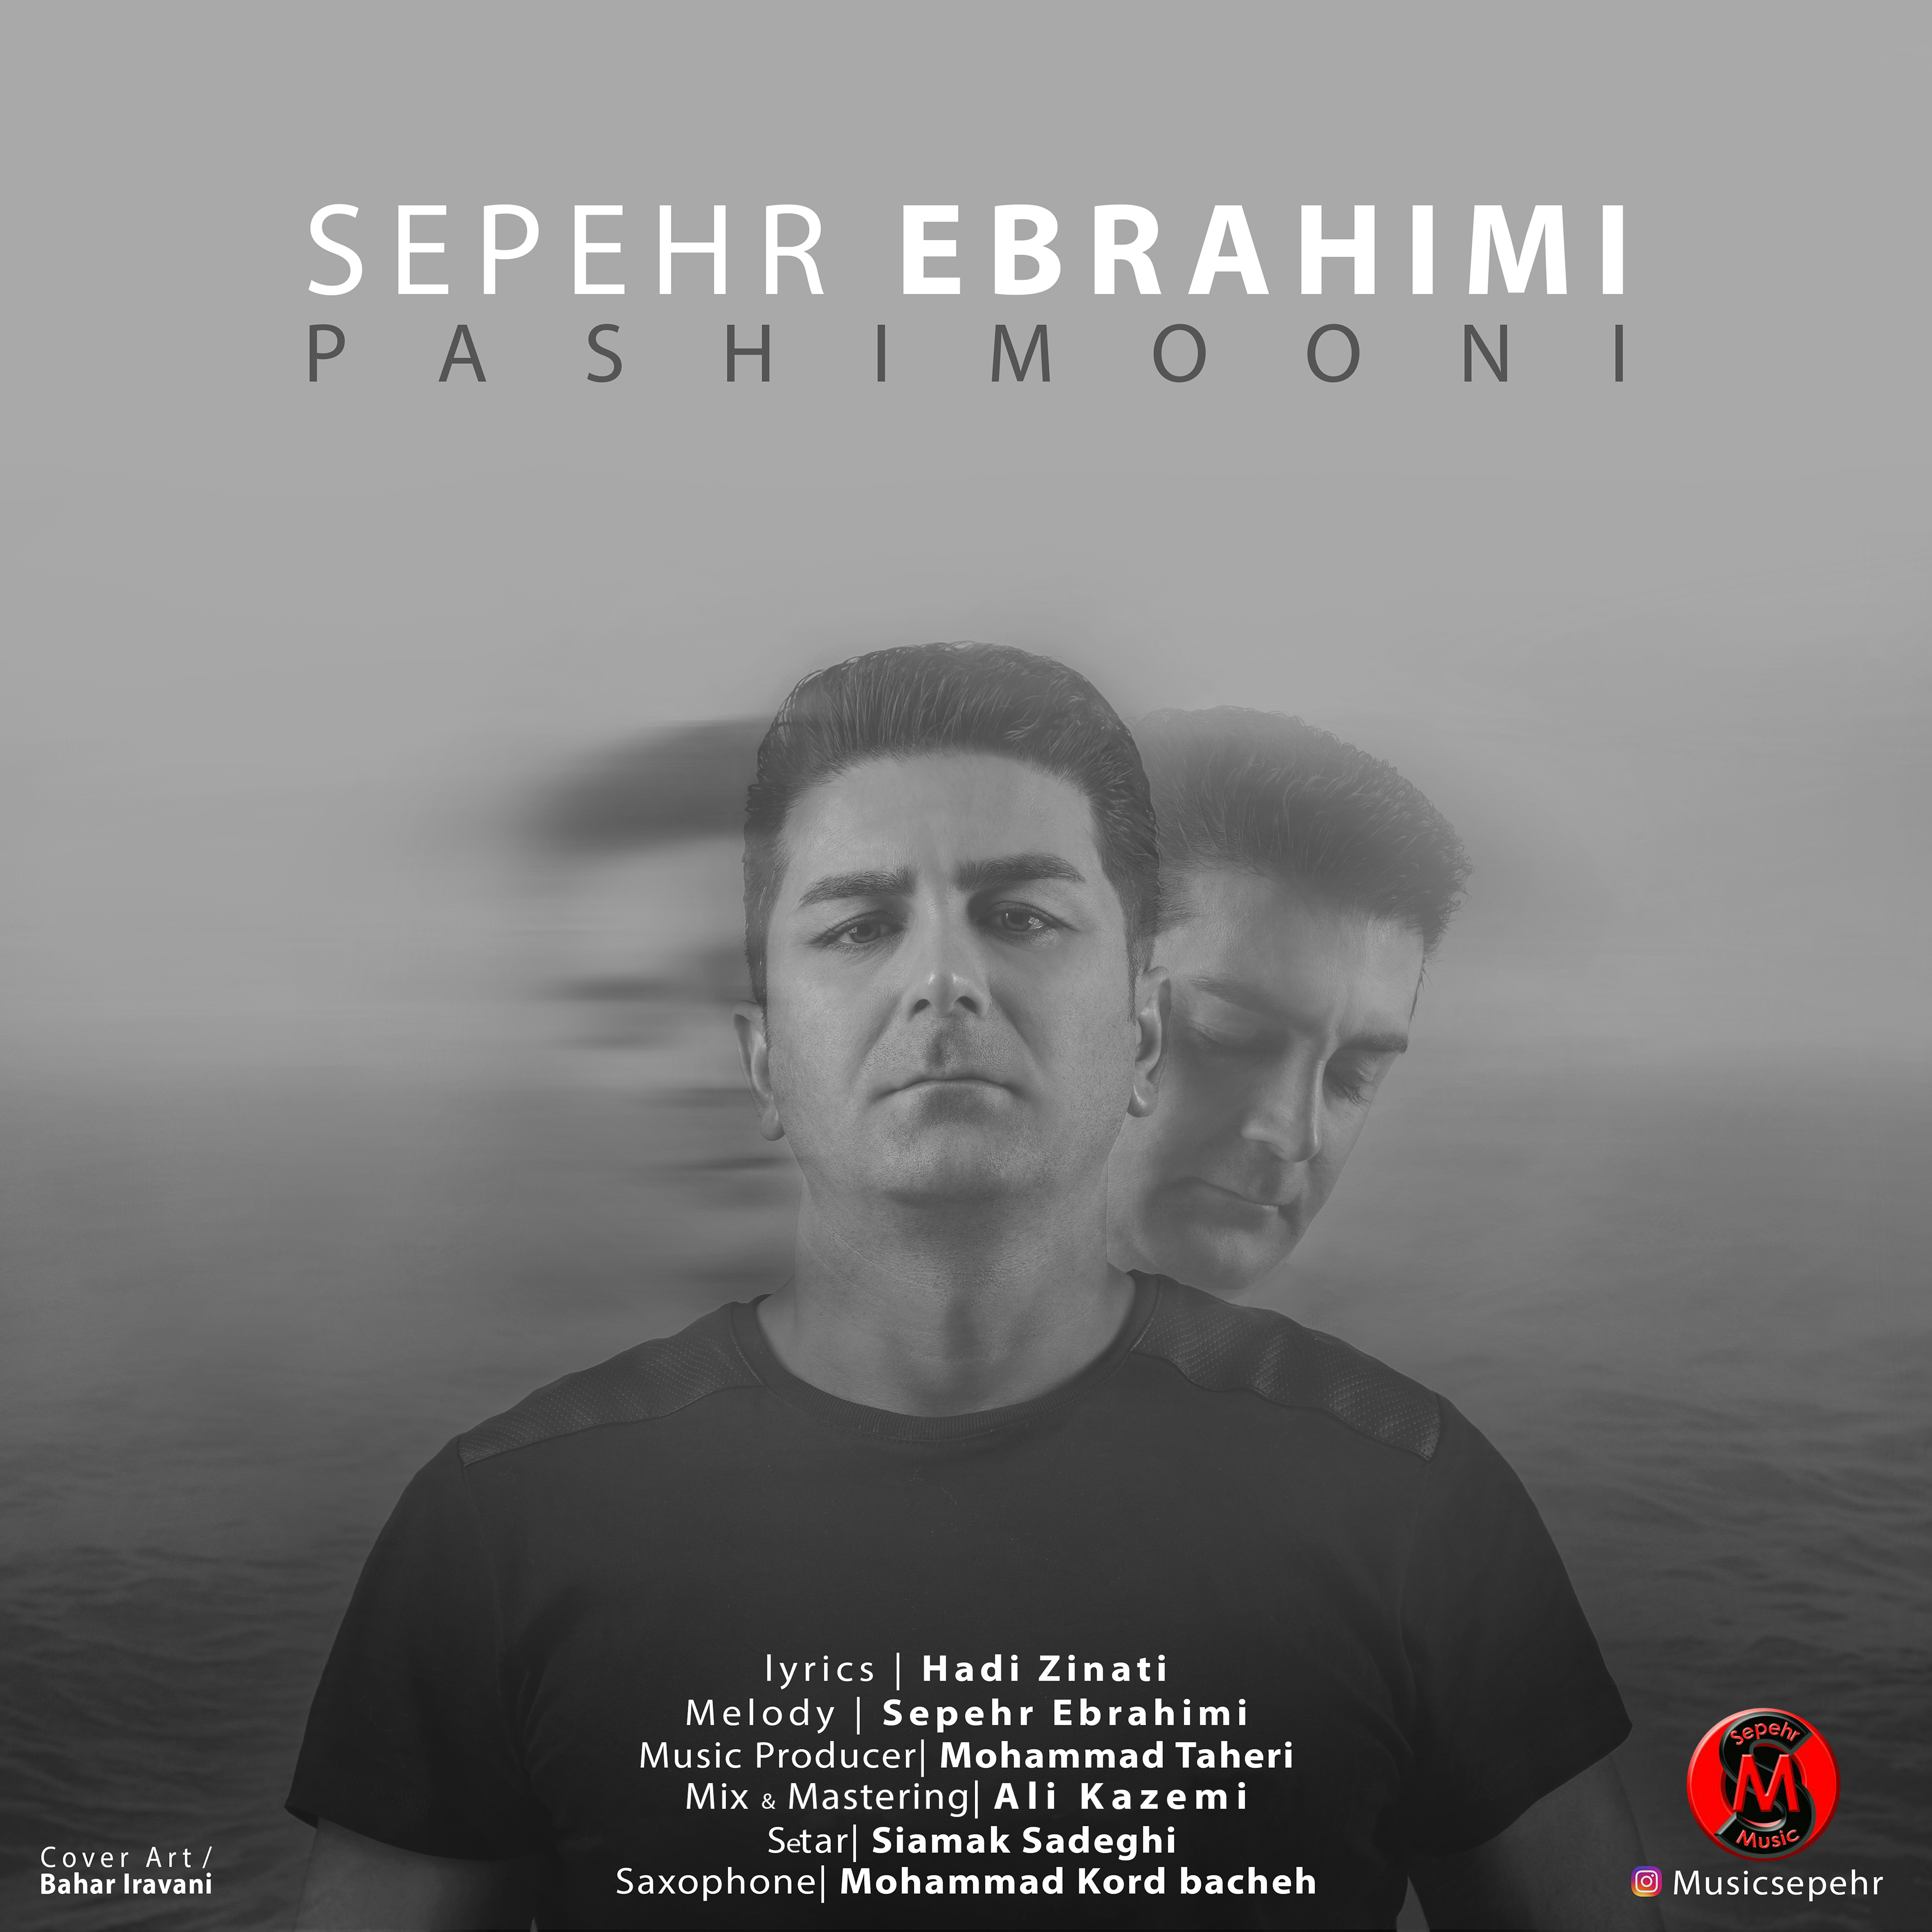 Sepehr Ebrahimi – Pashimooni